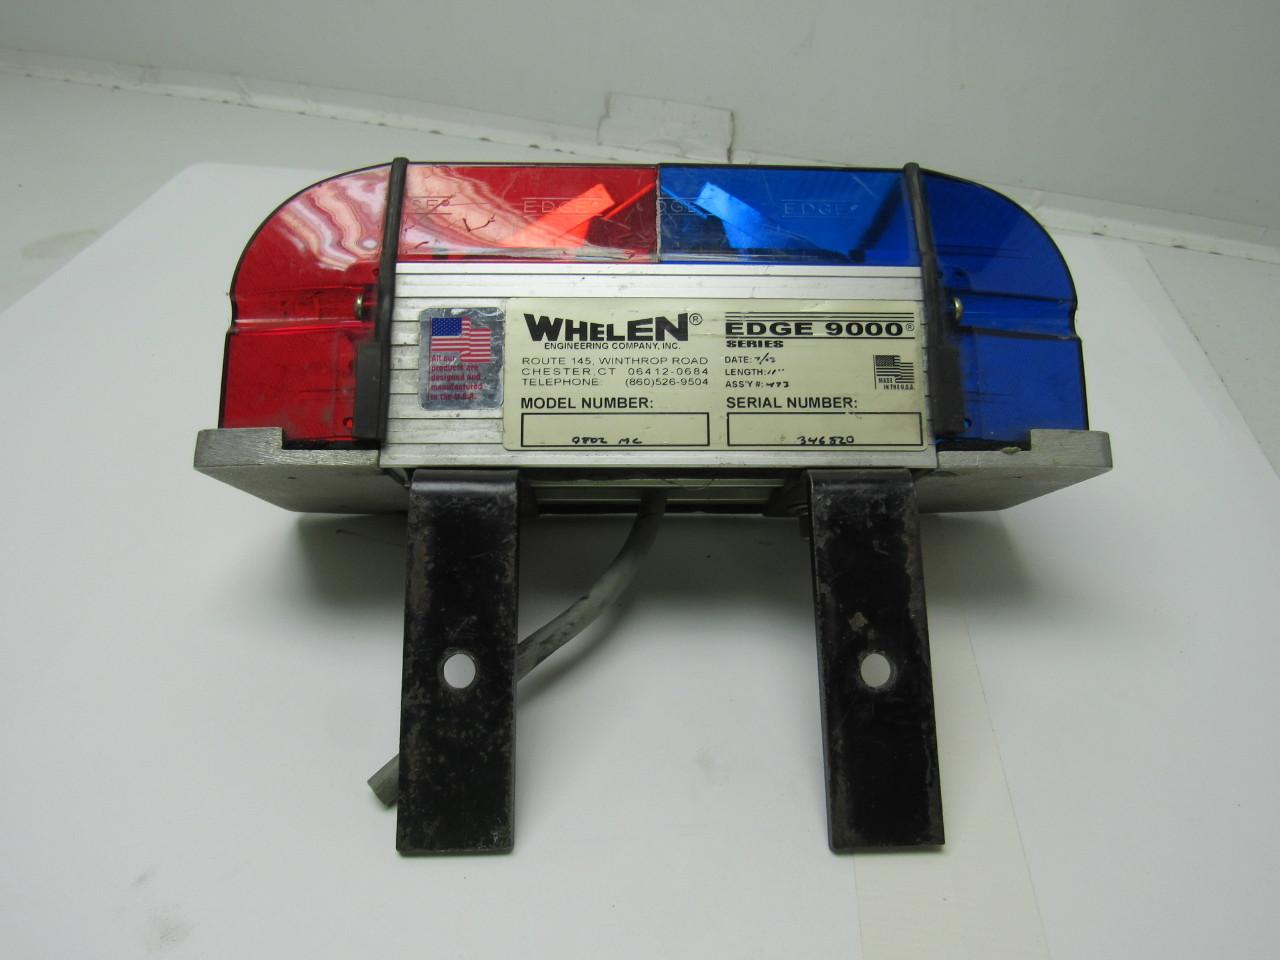 Wiring Diagram Whelen Edge Lfl Light Bar Diagram Wiring